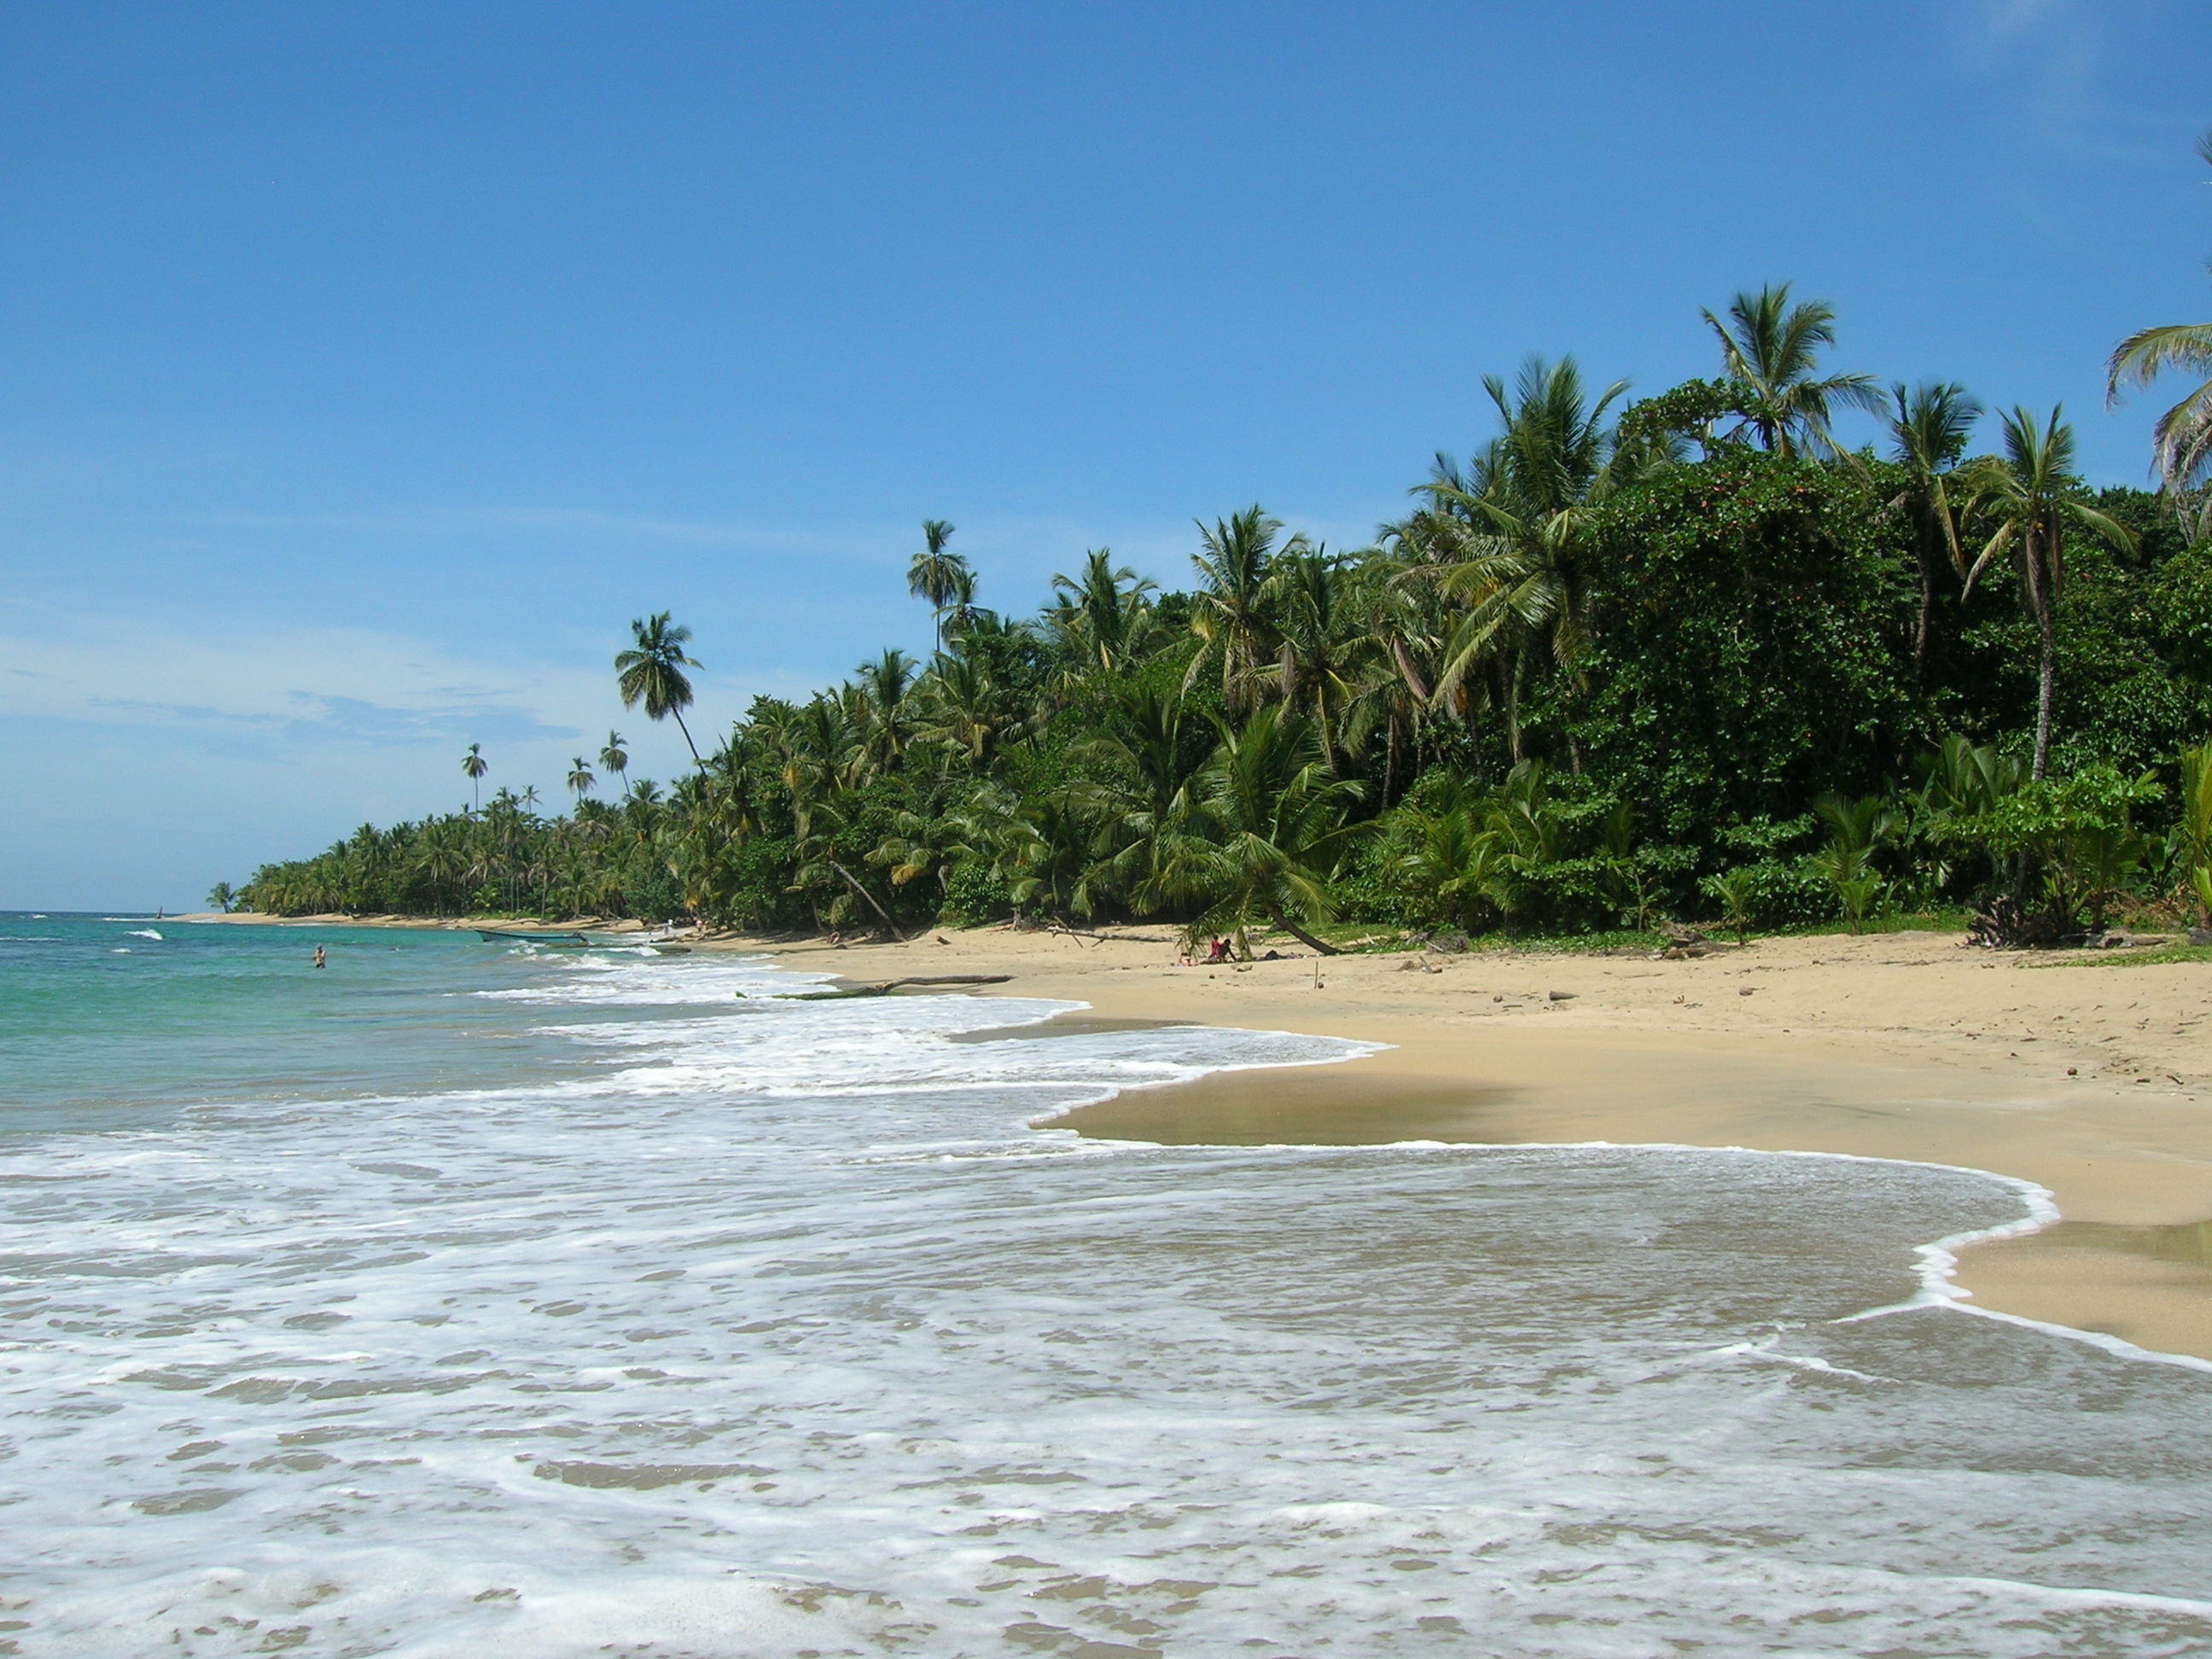 Water Beach Hotel Puerto Rico